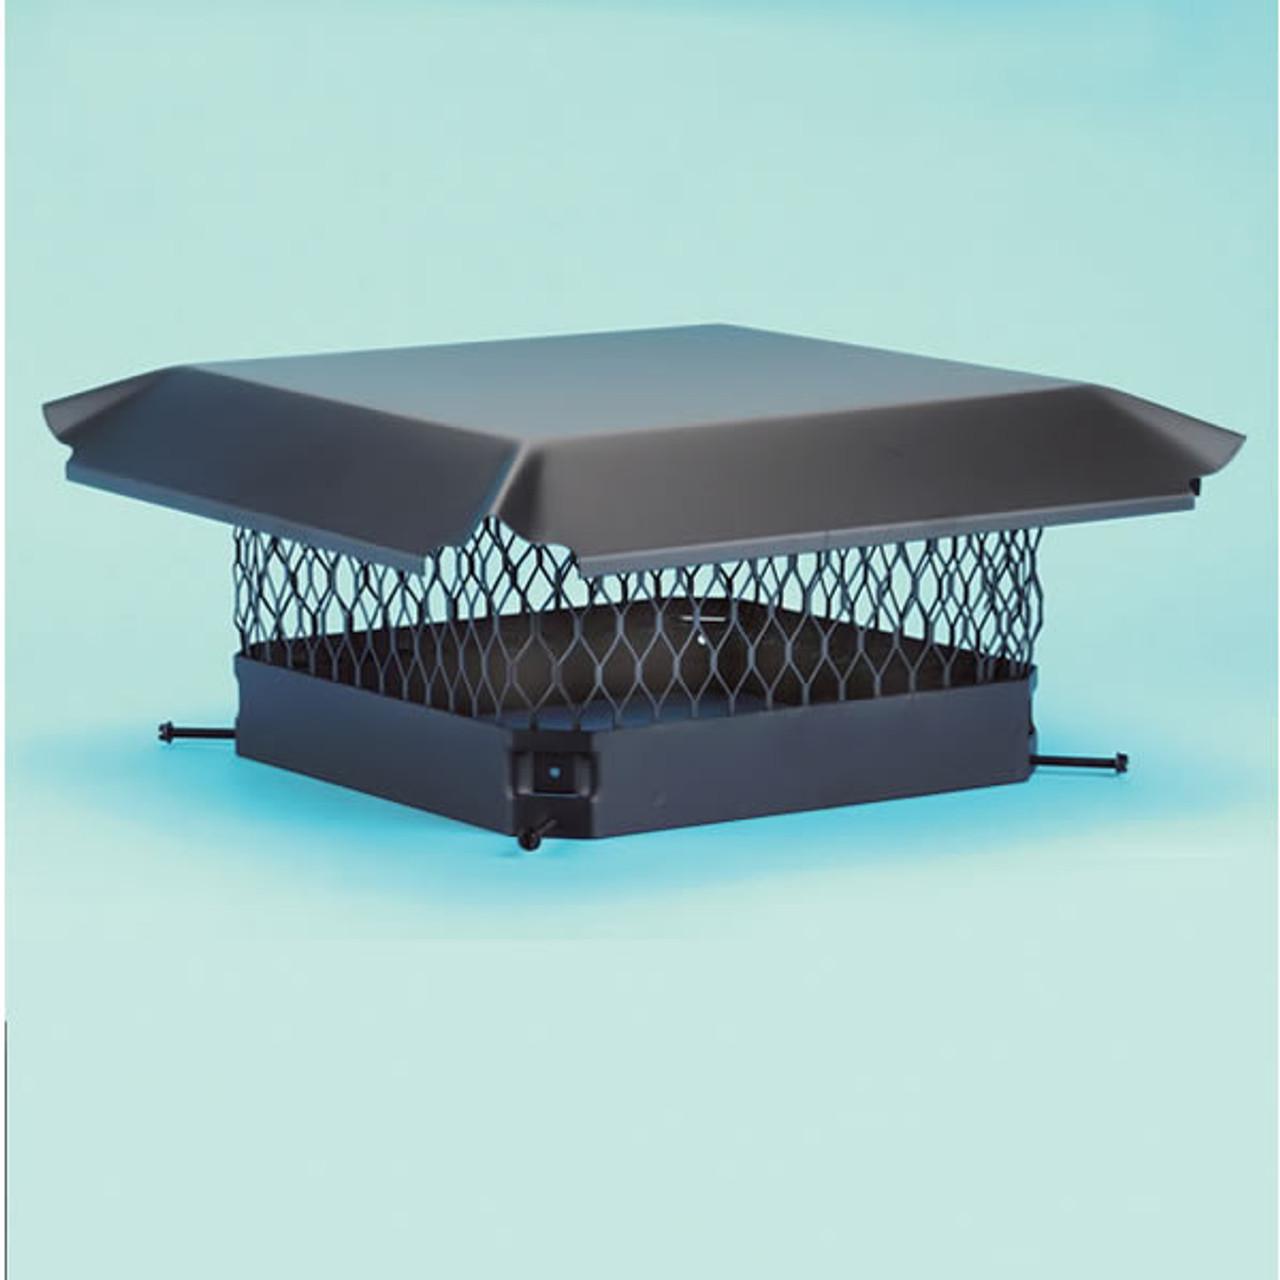 Hy-C galvanized chimney cap